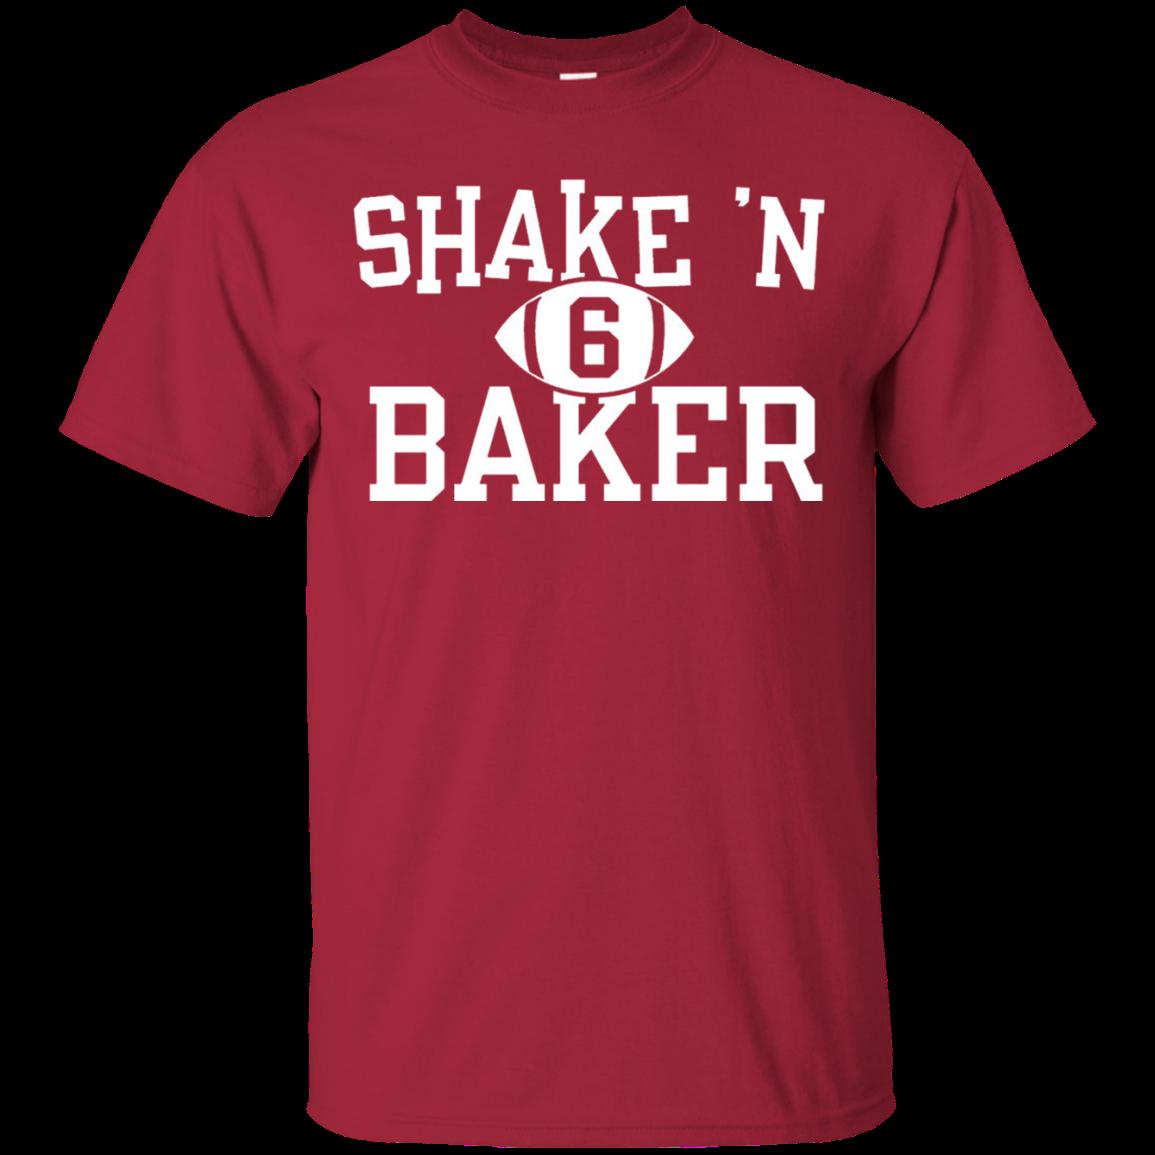 Baker Mayfield Shirt Baker mayfield shirt, Shirts